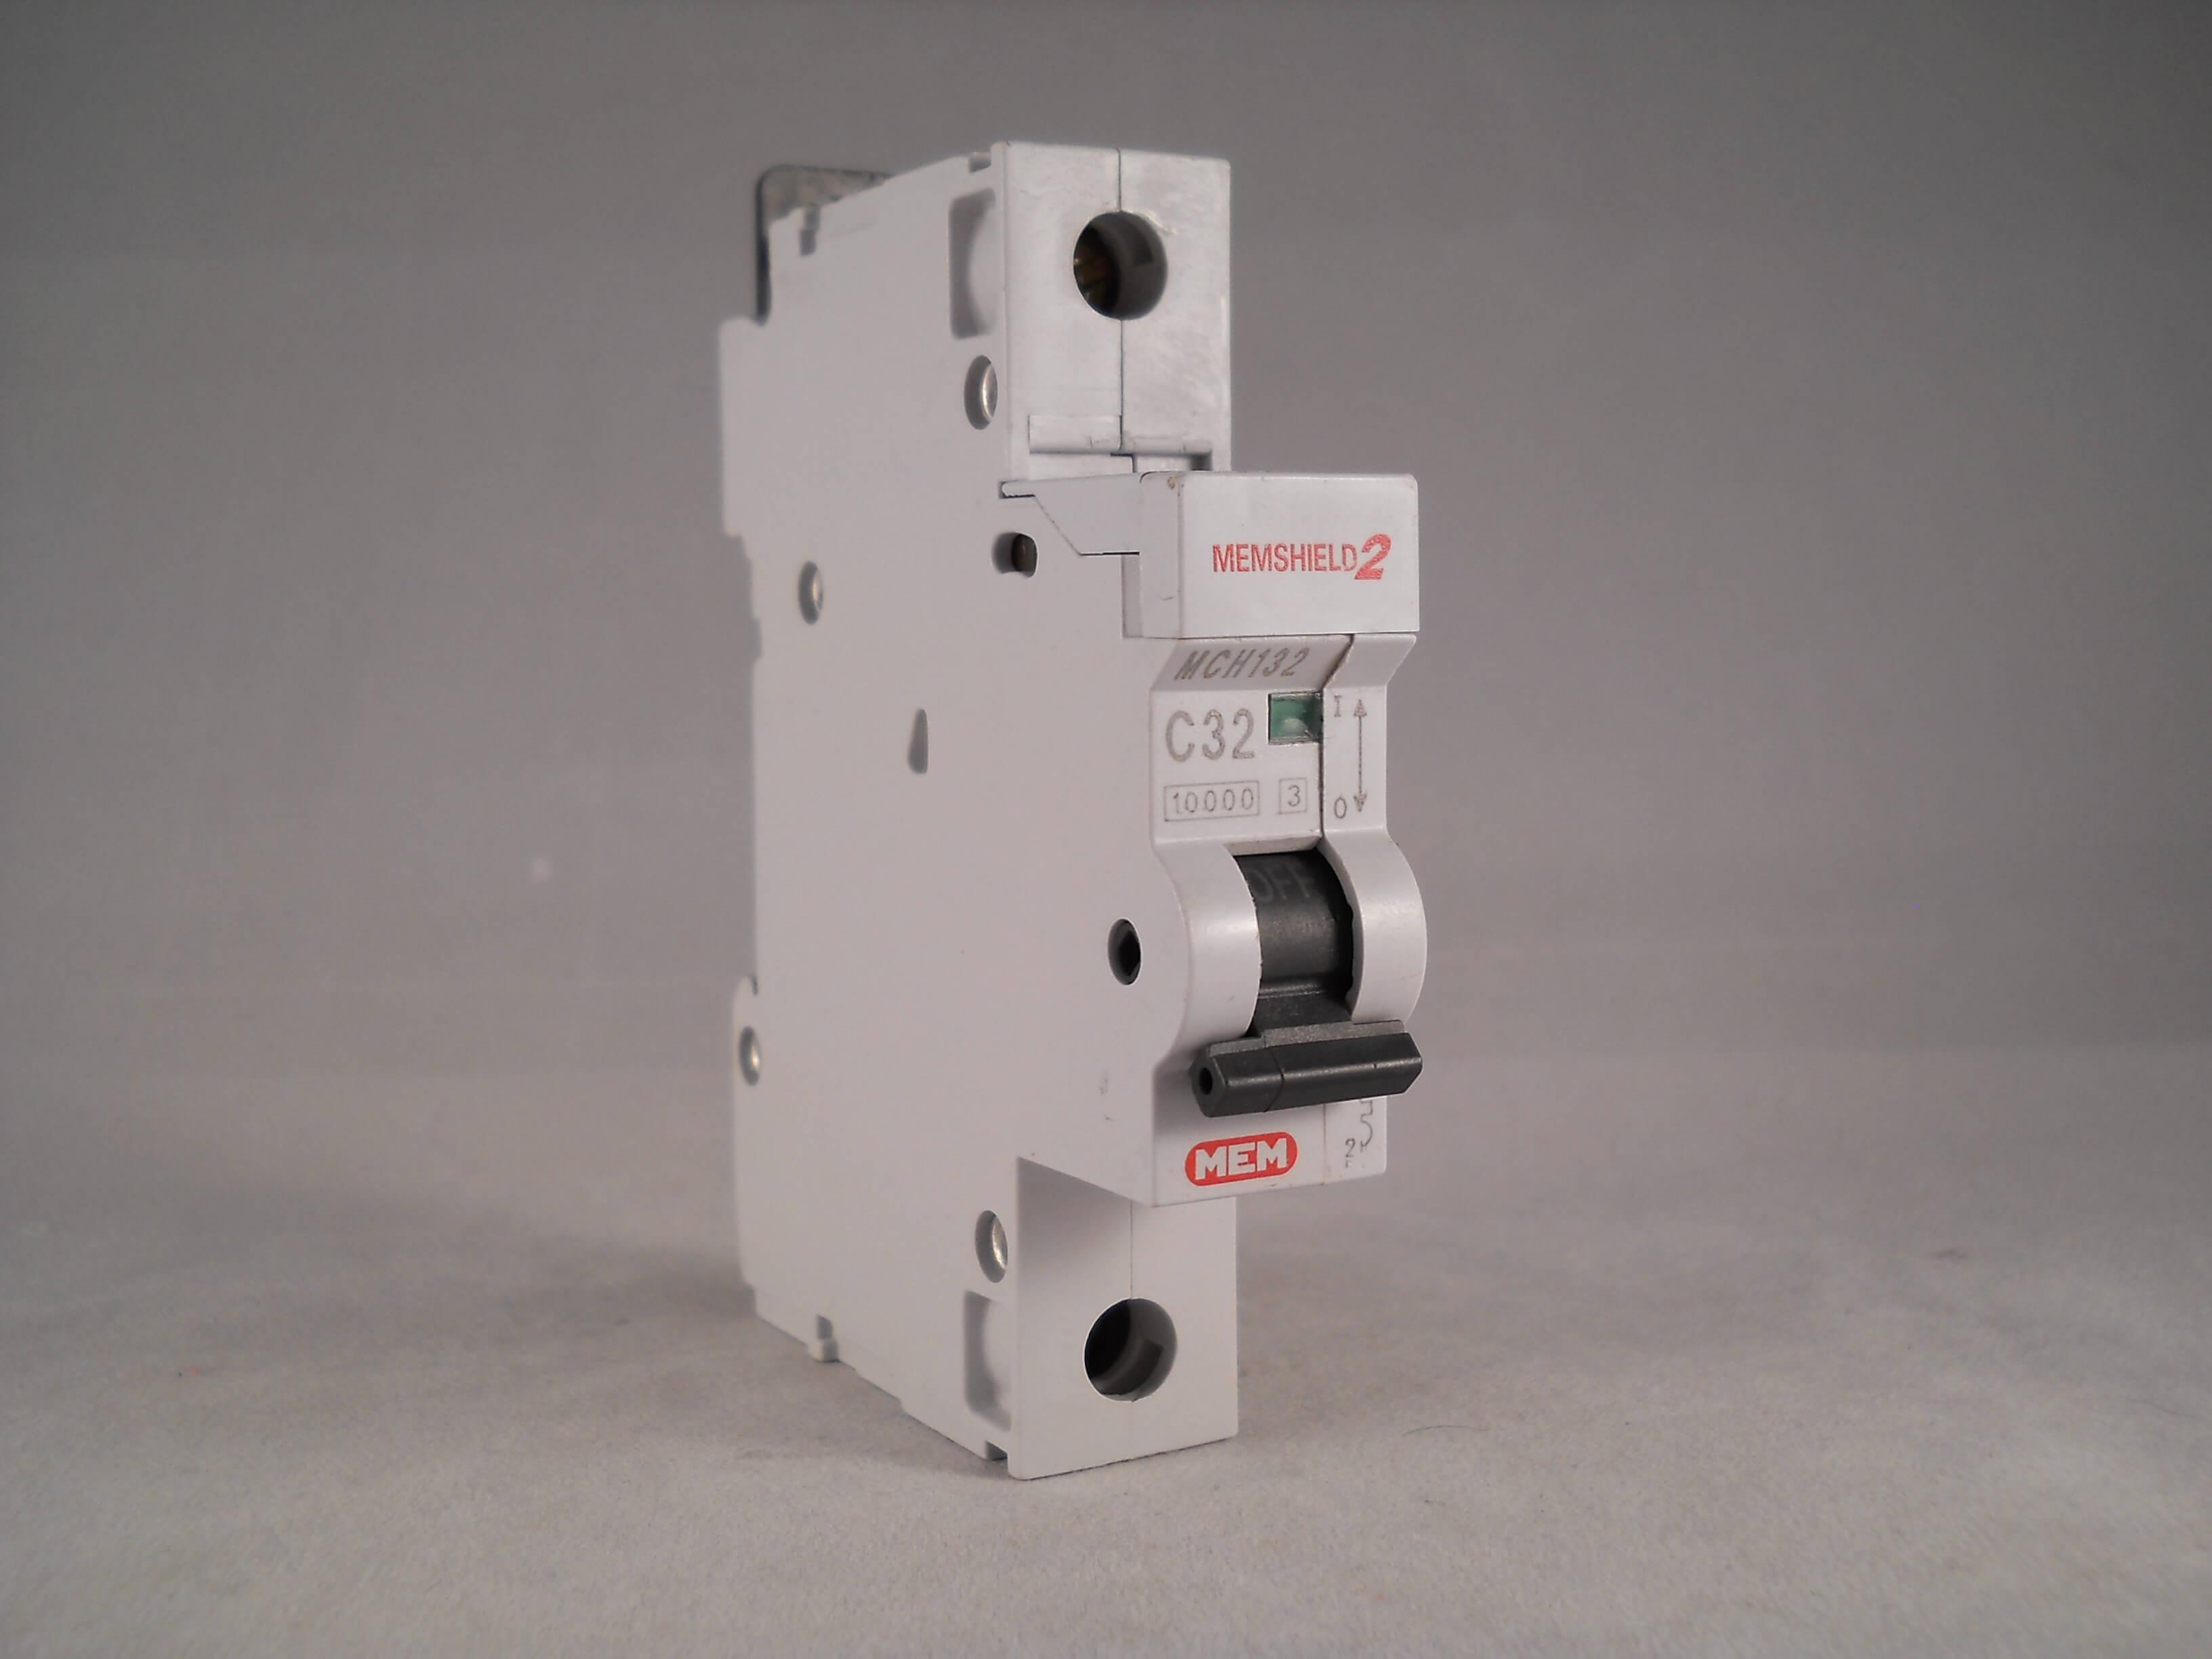 MEM Memshield 2 MCB 32 Amp Type C 32A Single Pole Circuit Breaker MCH132